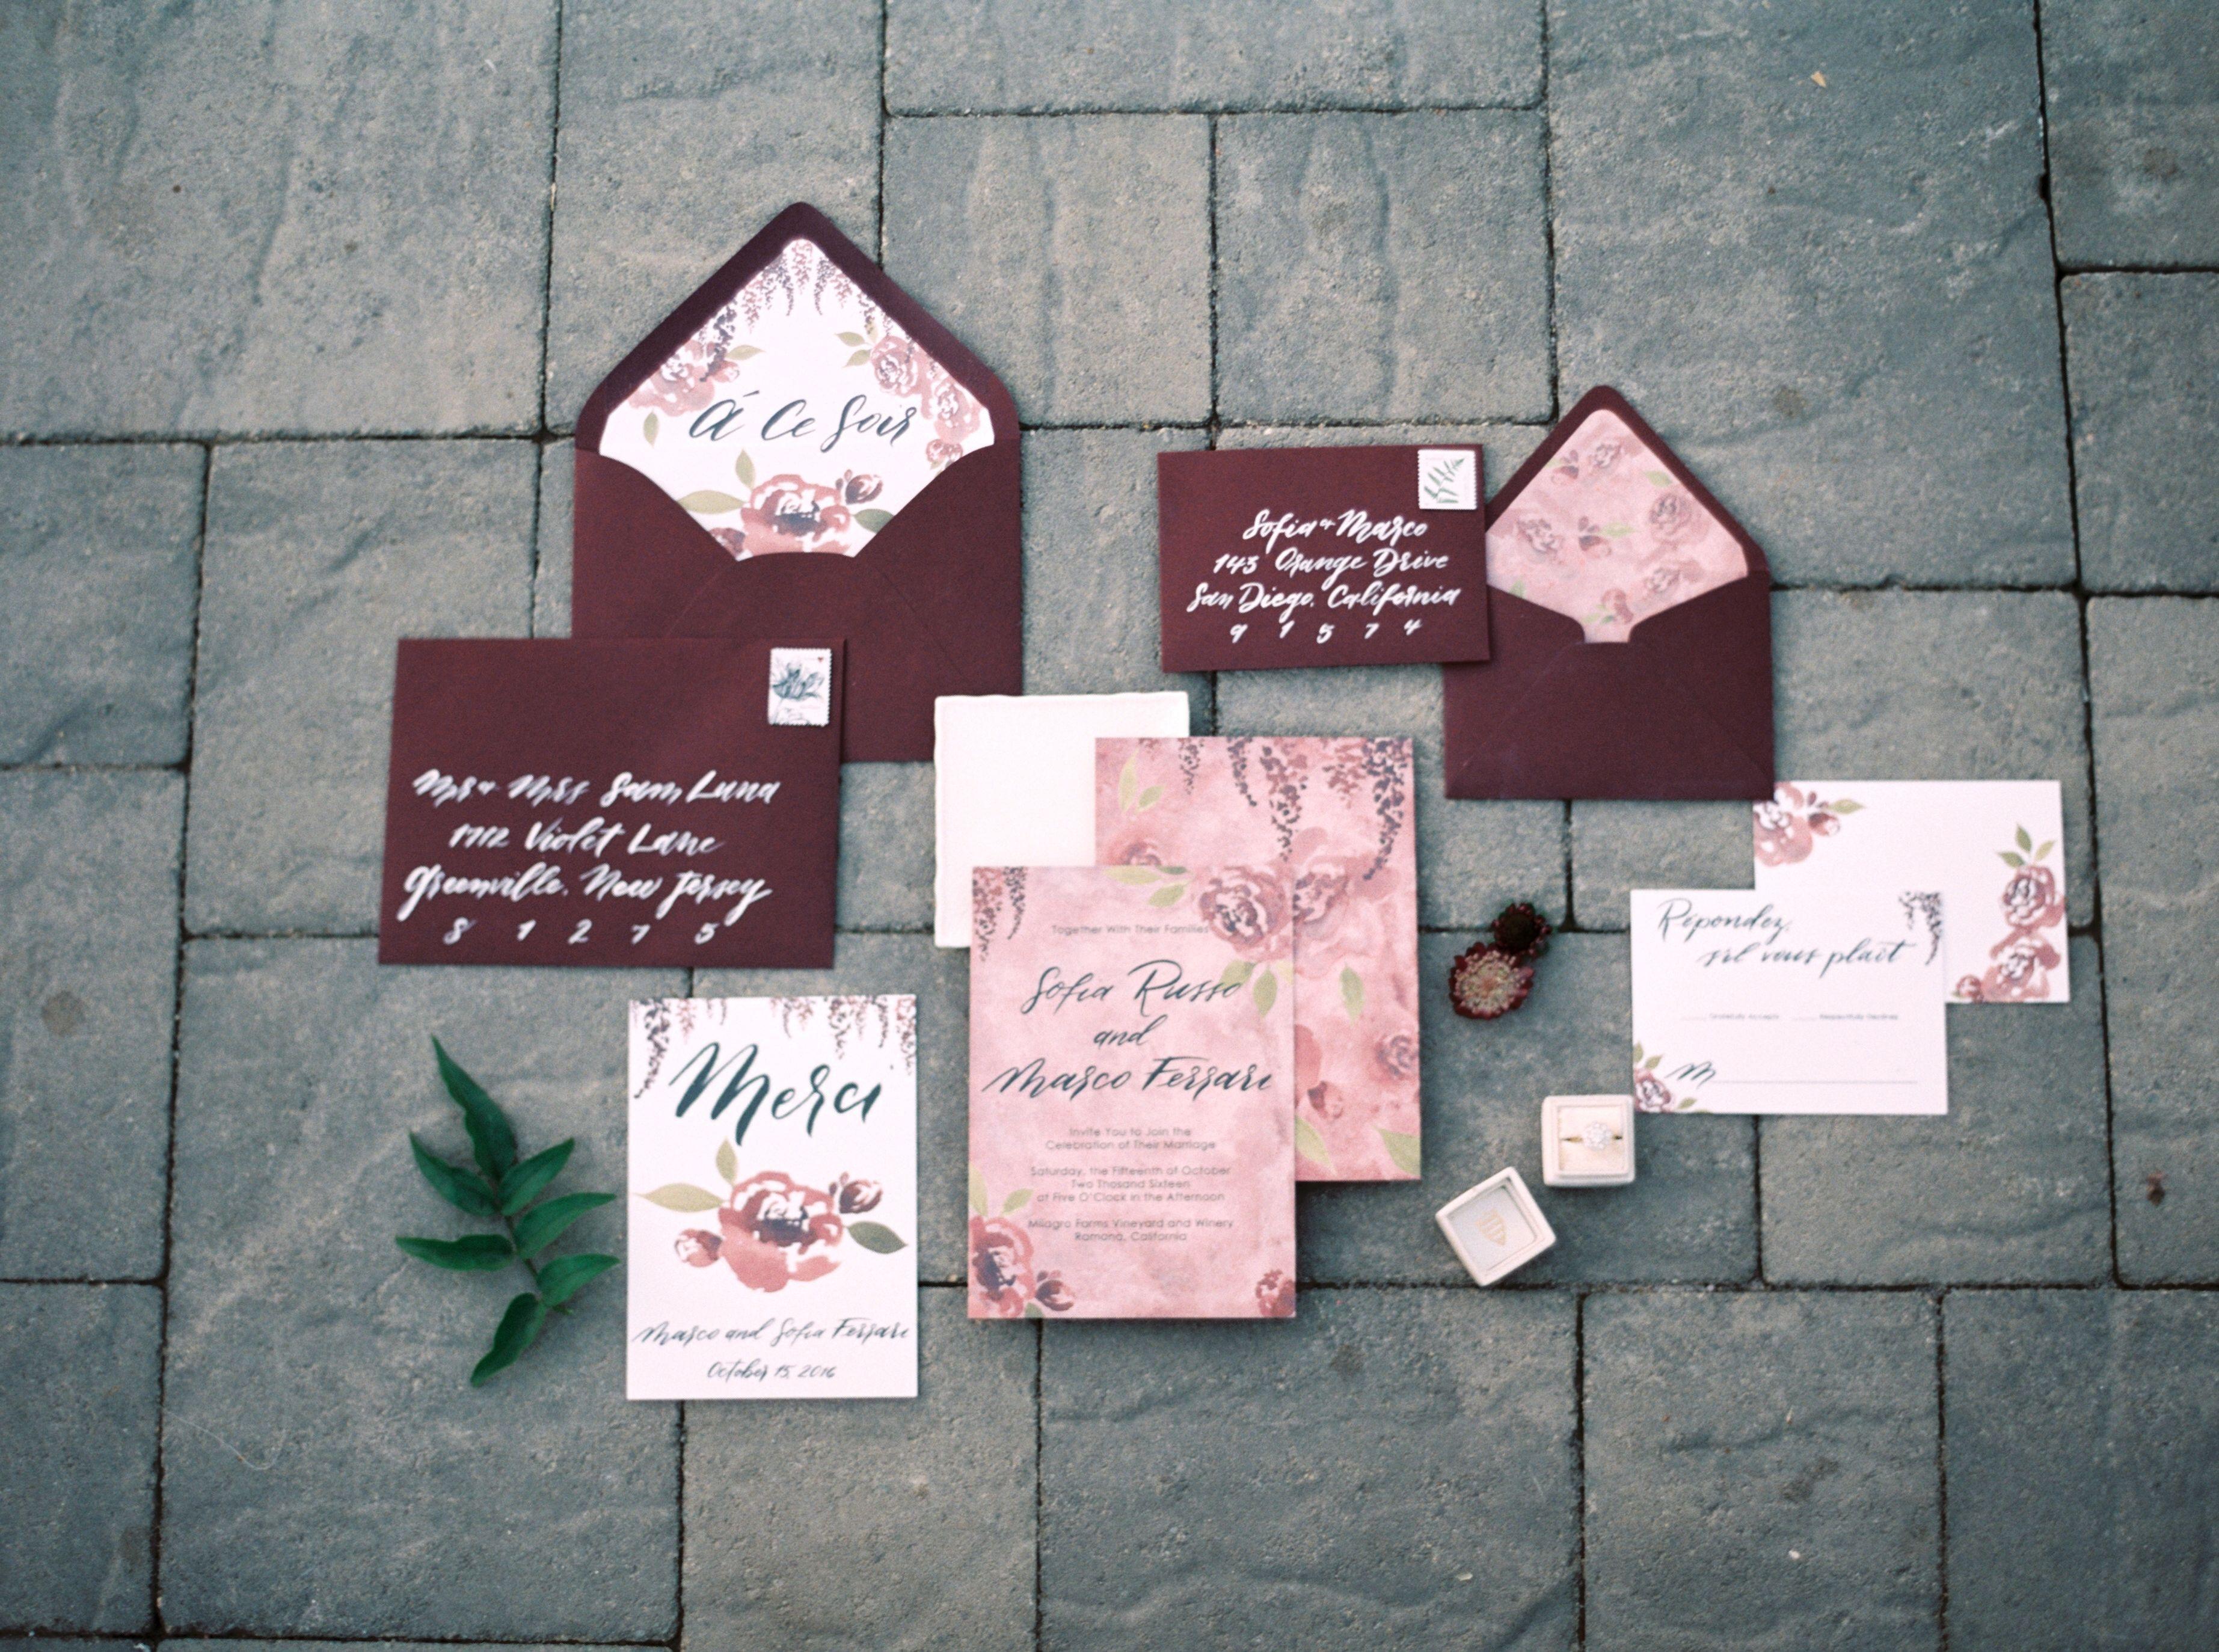 Maroon and blue wedding decor  GORGEOUS FRENCH WEDDING INSPIRATION  Deep maroon red marsala